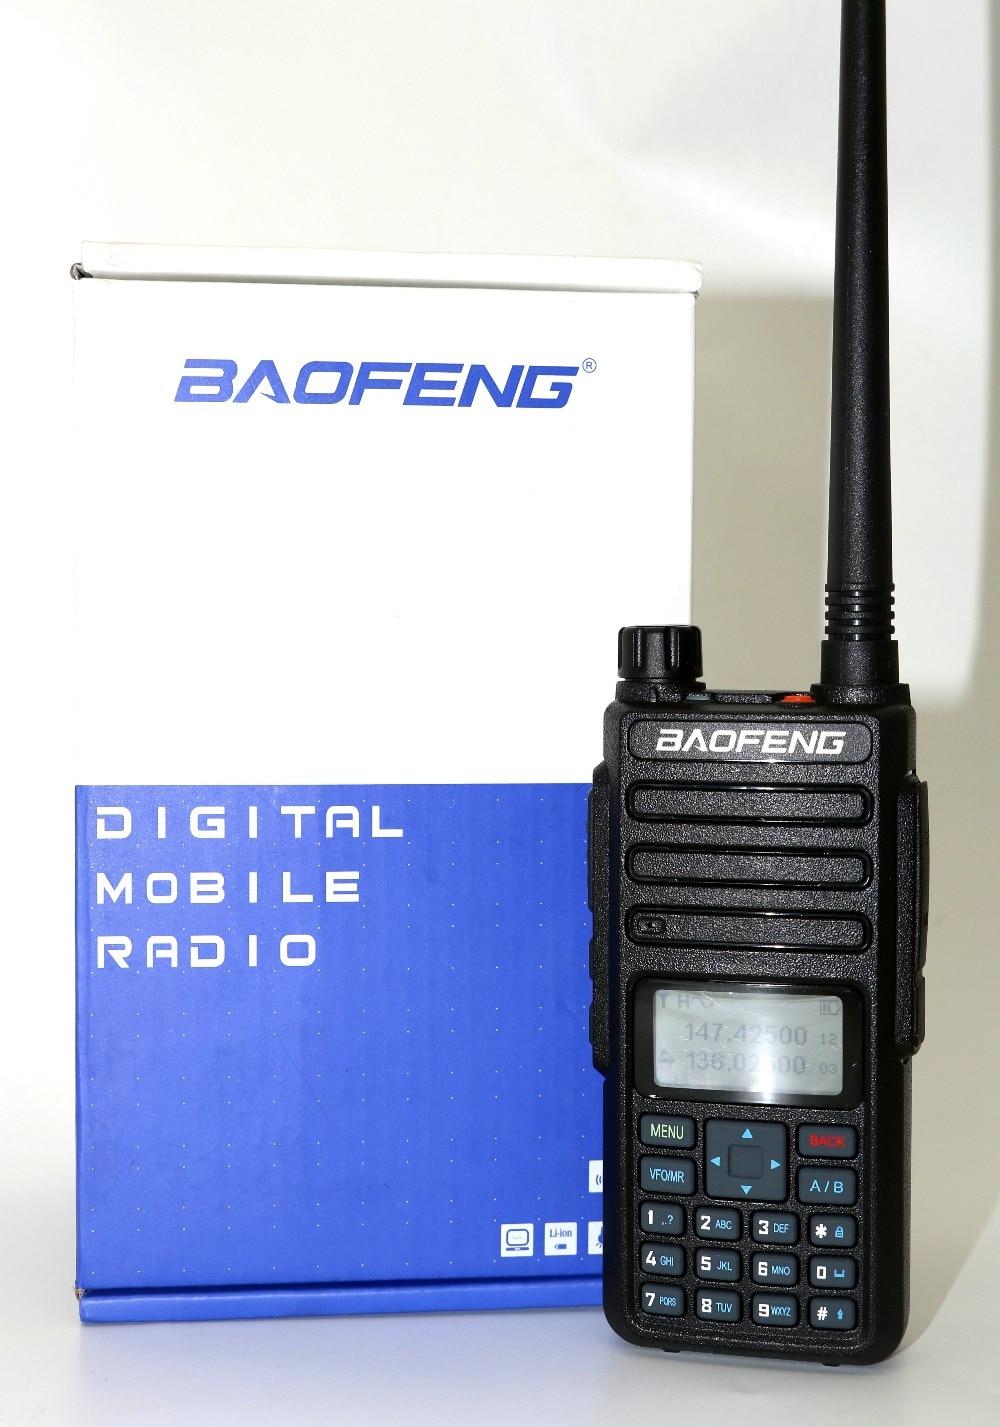 Baofeng Dual Slot di Tempo DM-180 Radio Portatile Dual Band 5 w 1024ch tier2 e tier1 DMR Walkie Taklie Digital Anolog dual mode